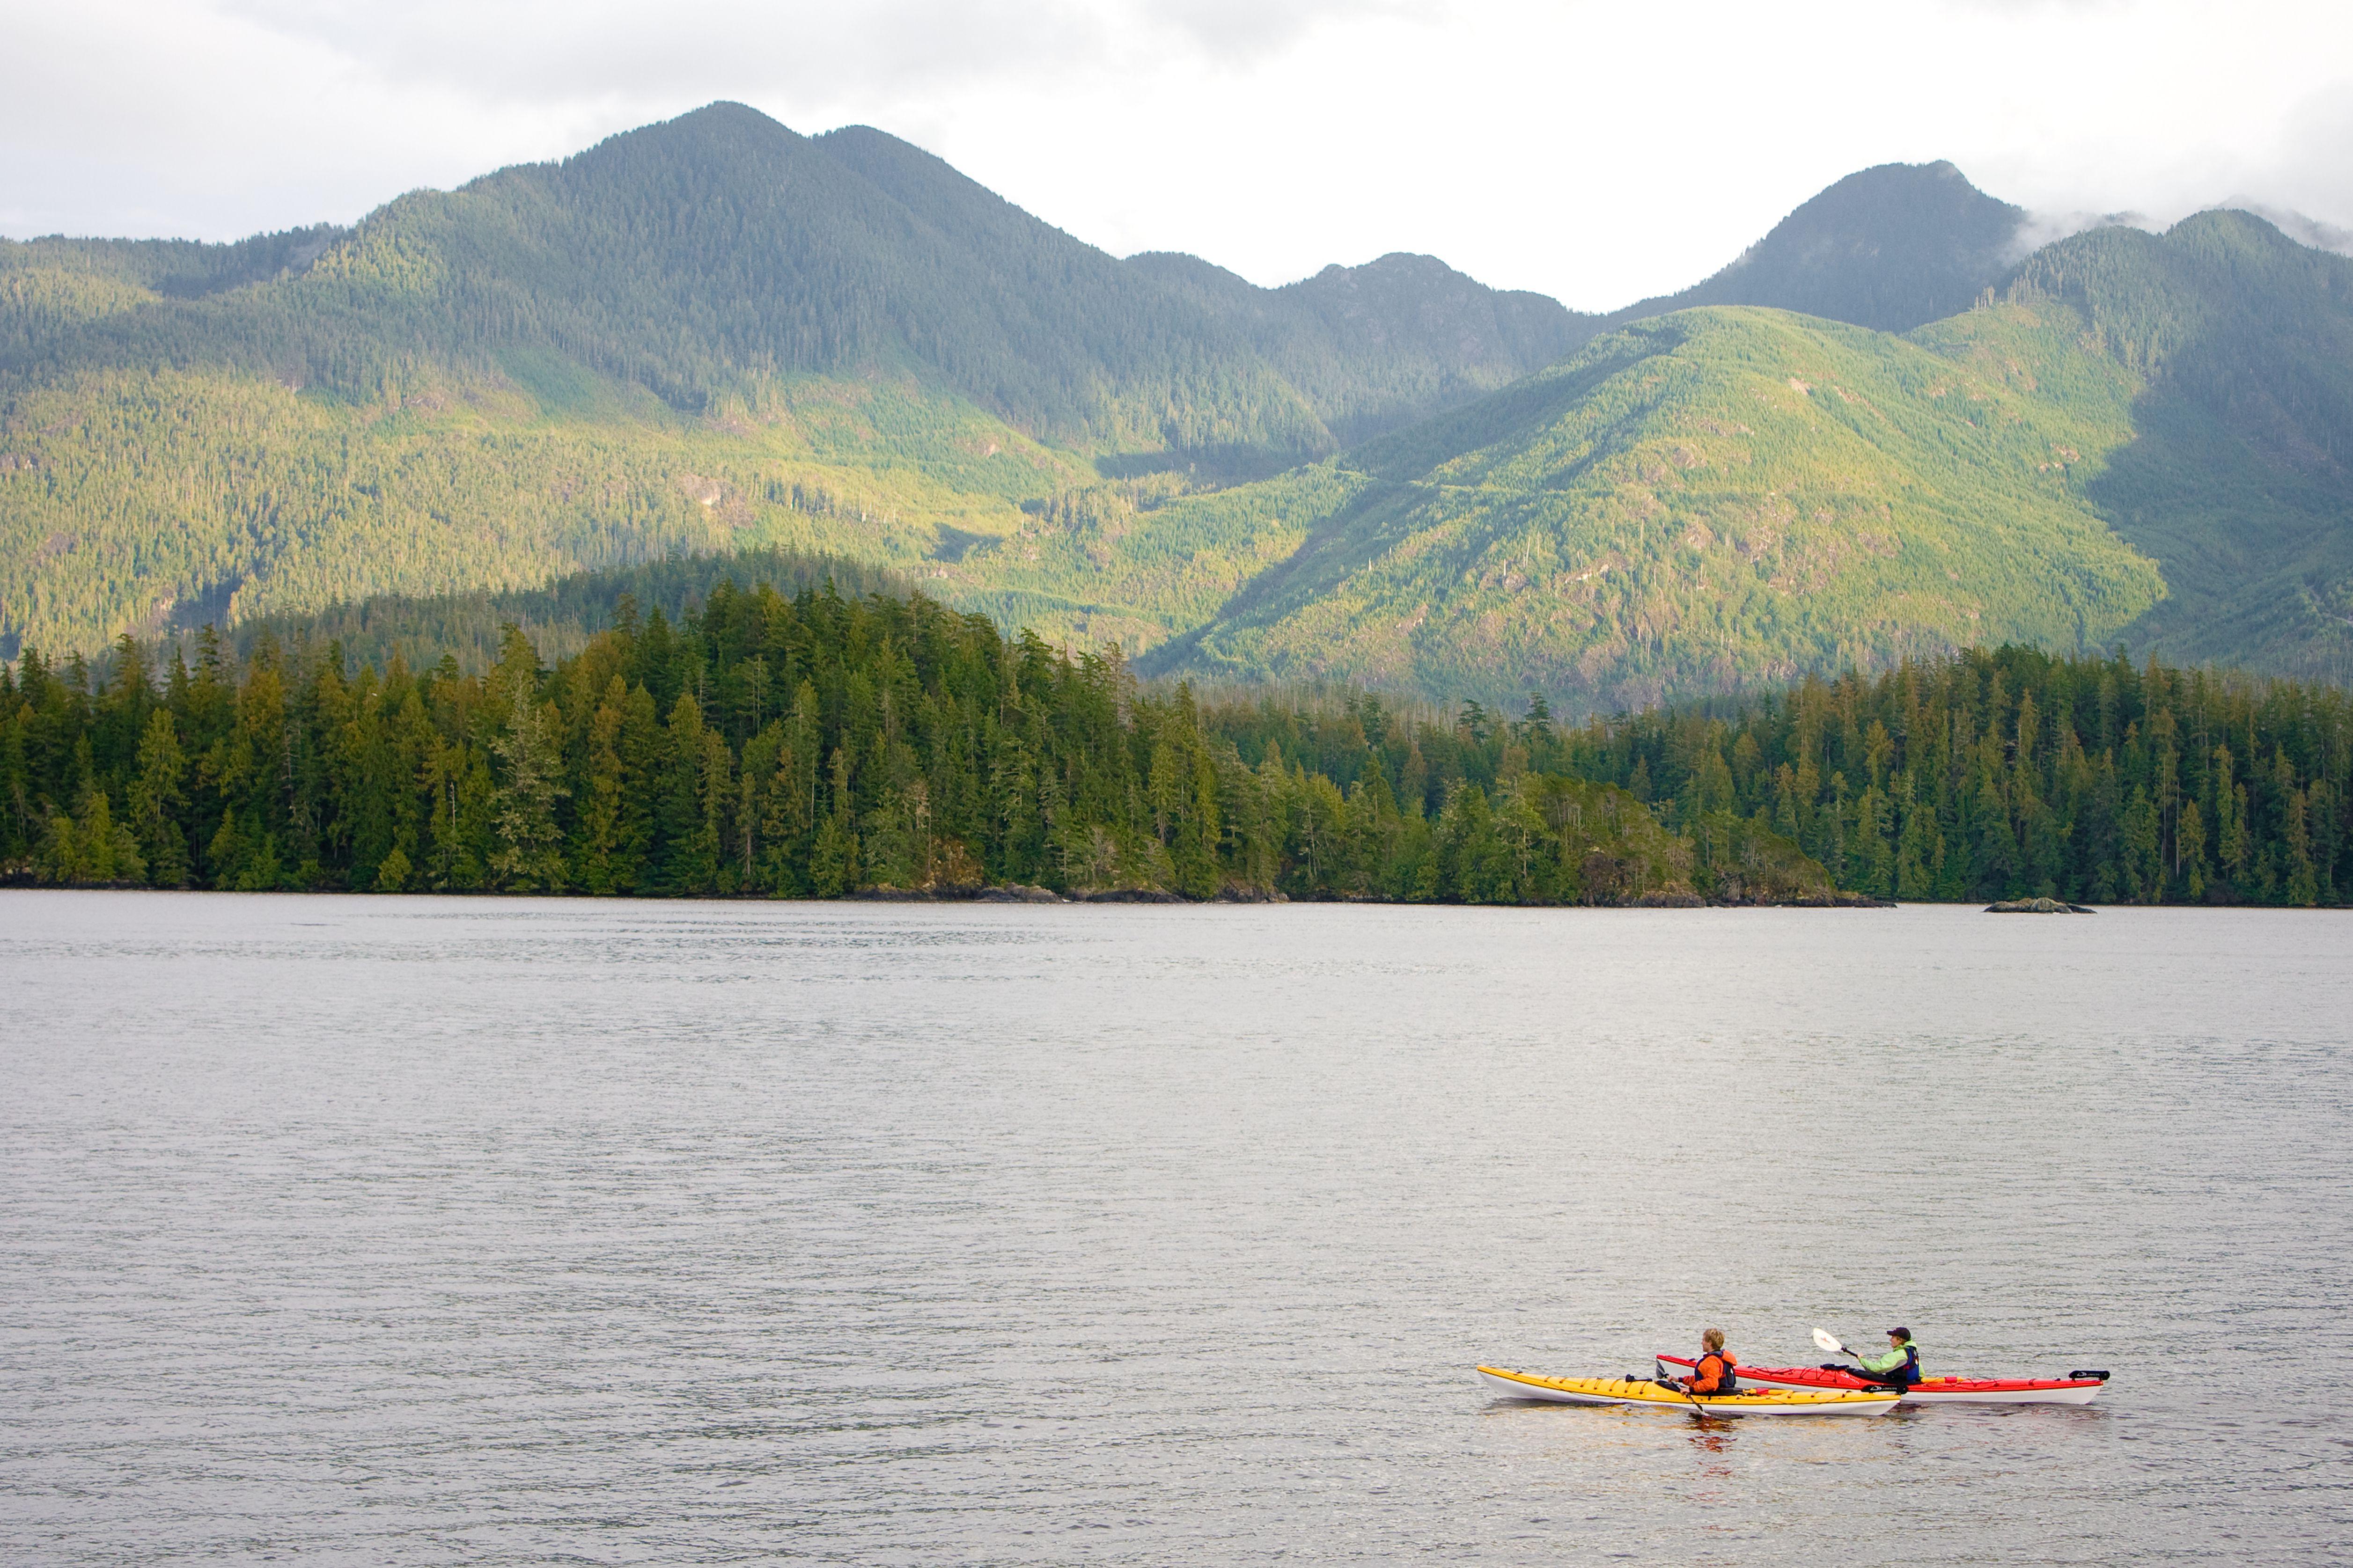 Canada, British Columbia, Vancouver Island, Nootka Sound, Mid adult couple sea kayaking